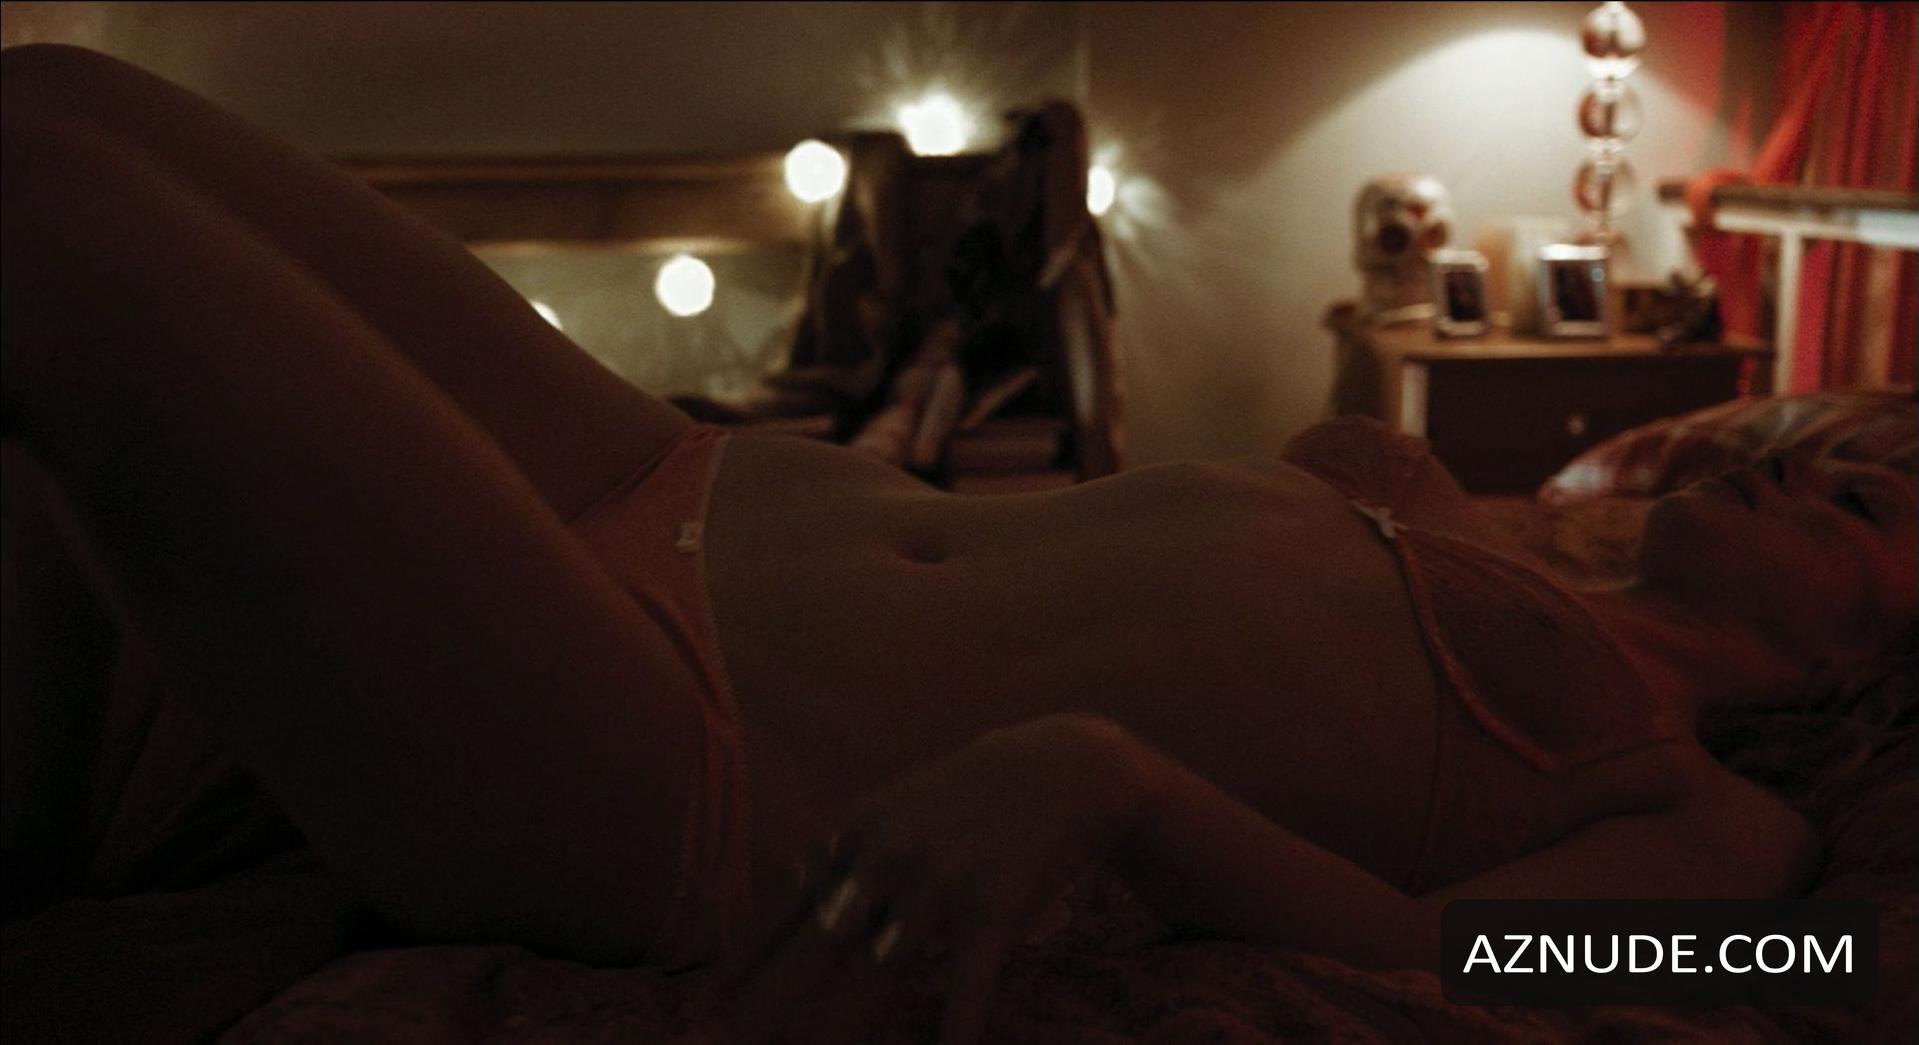 Anna walton nude